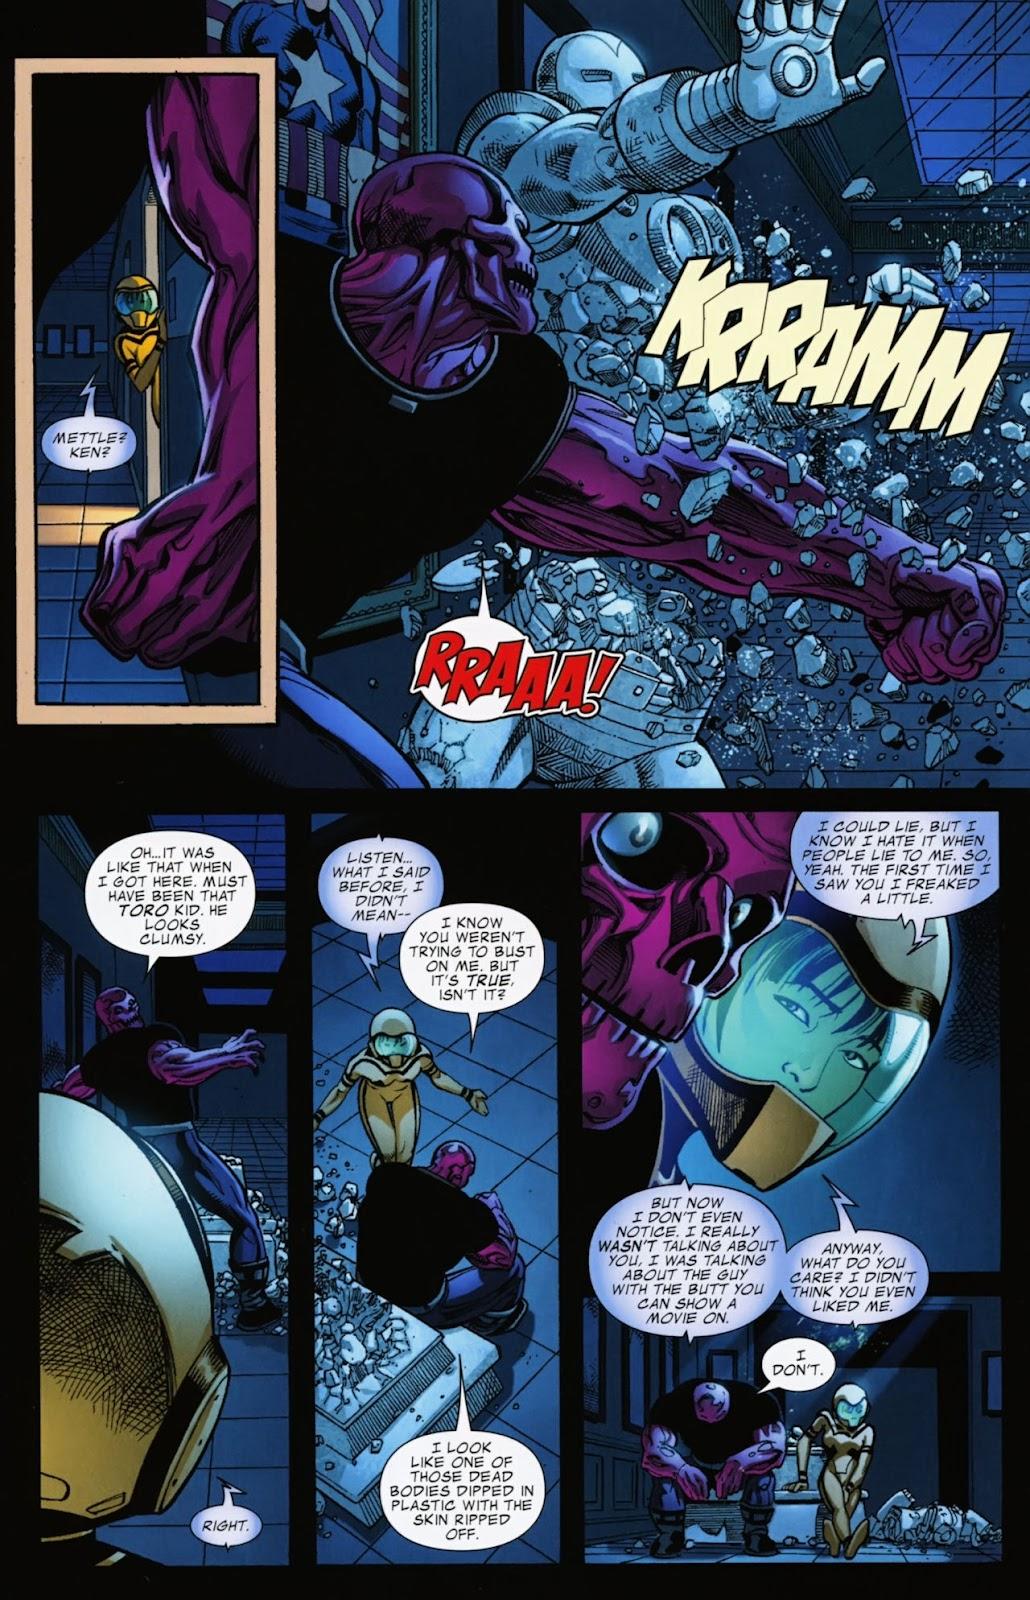 Comic Avengers Academy issue 13